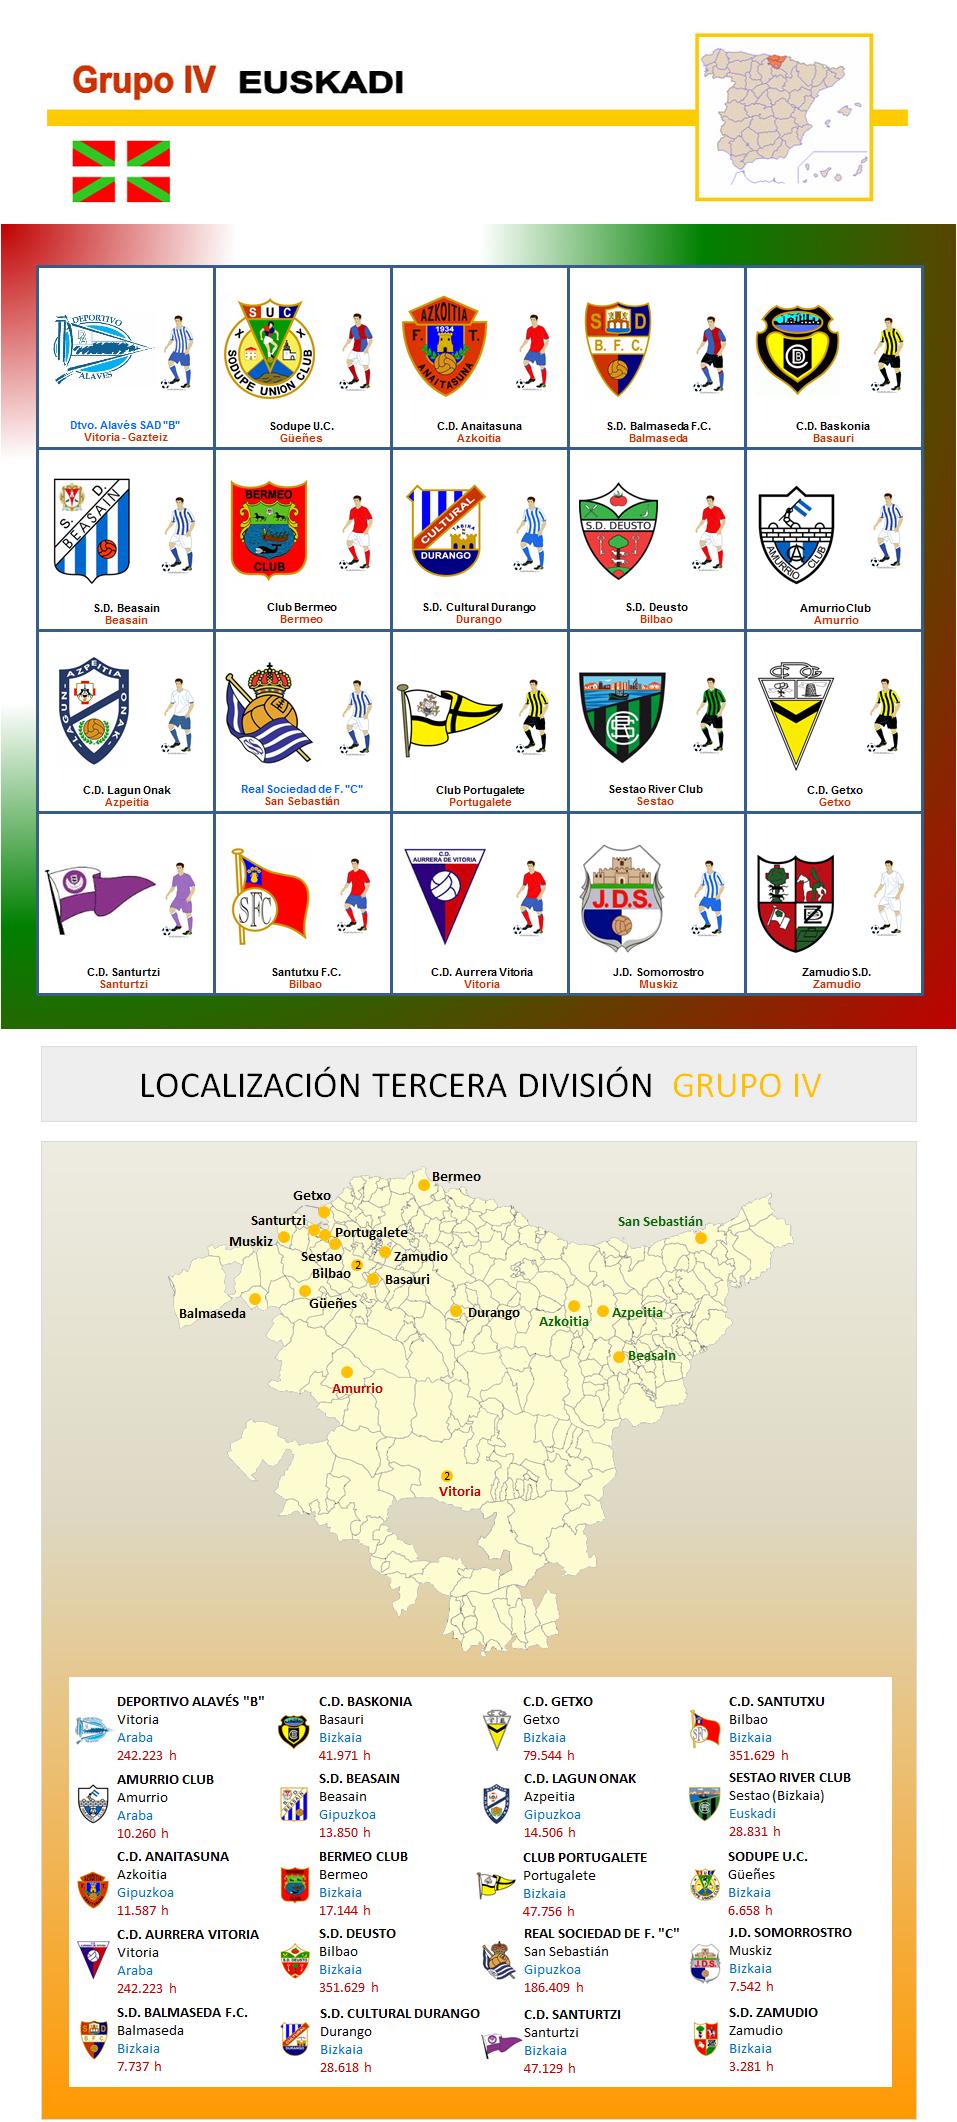 tercera division grupo 4 euskadi | Hiszpania | Pinterest | Tercera ...